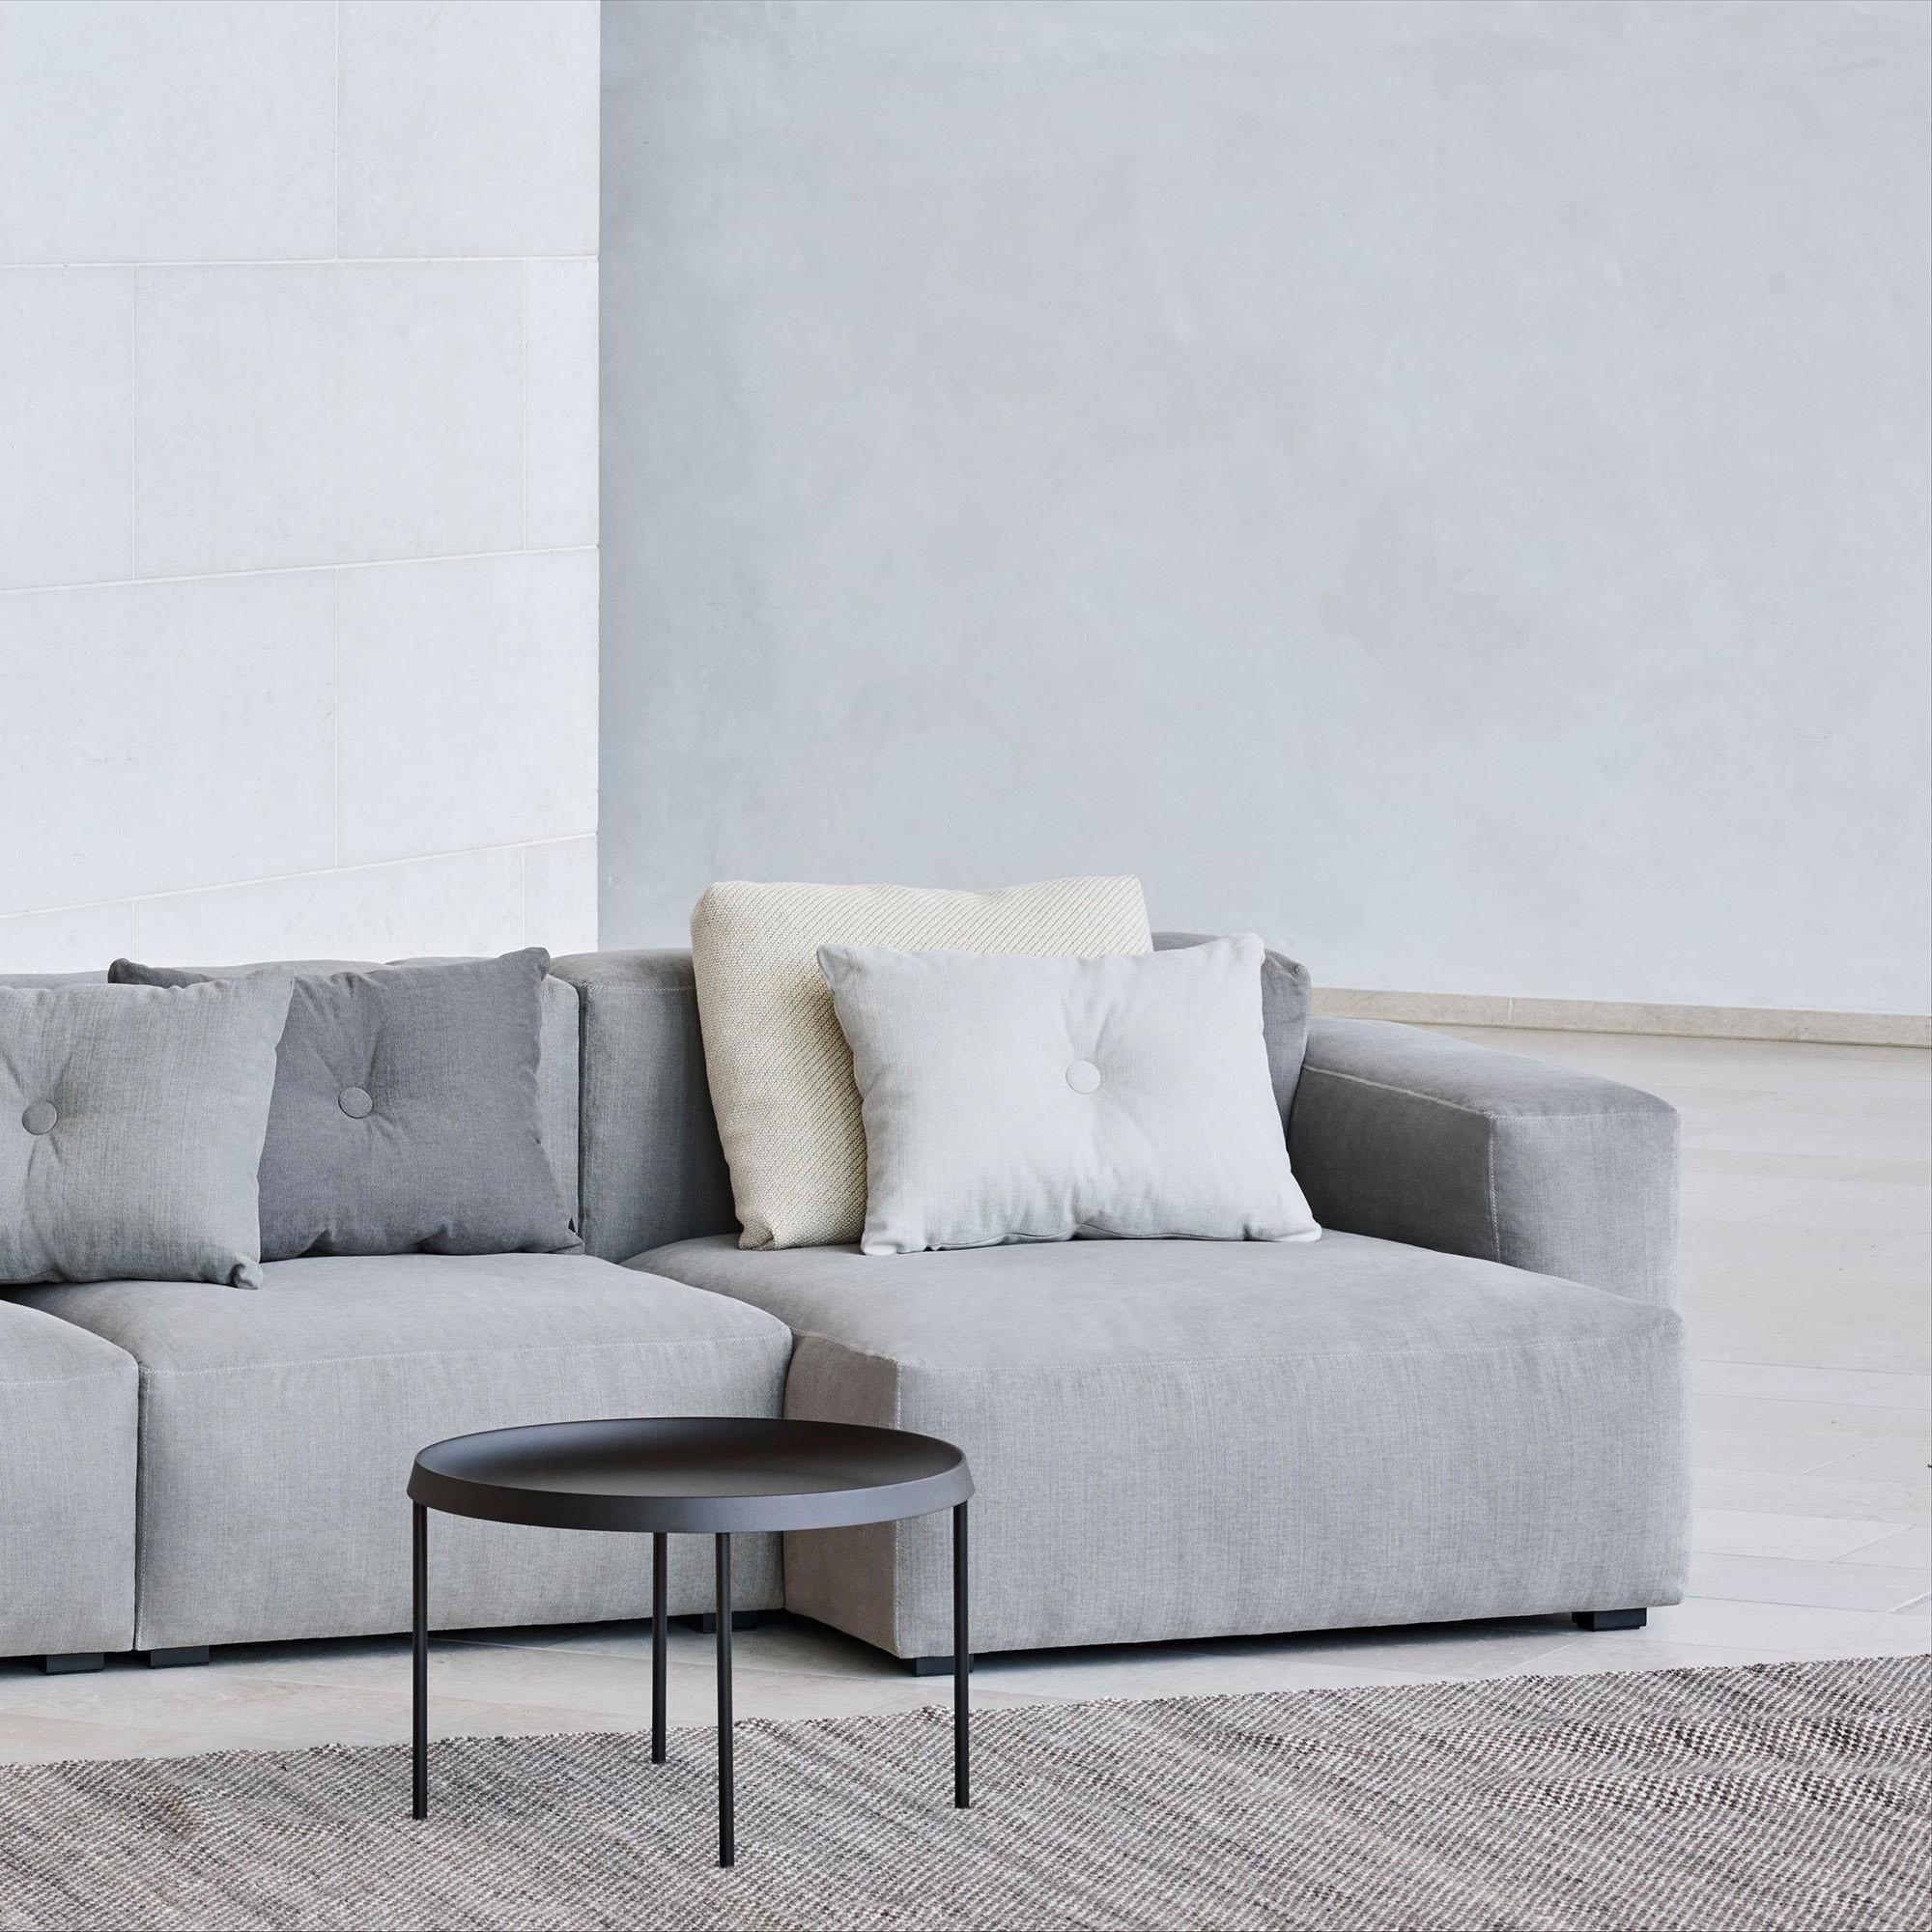 Hay Mags Soft 3 Sitzer Sofa Armlehne Niedrig 321x127